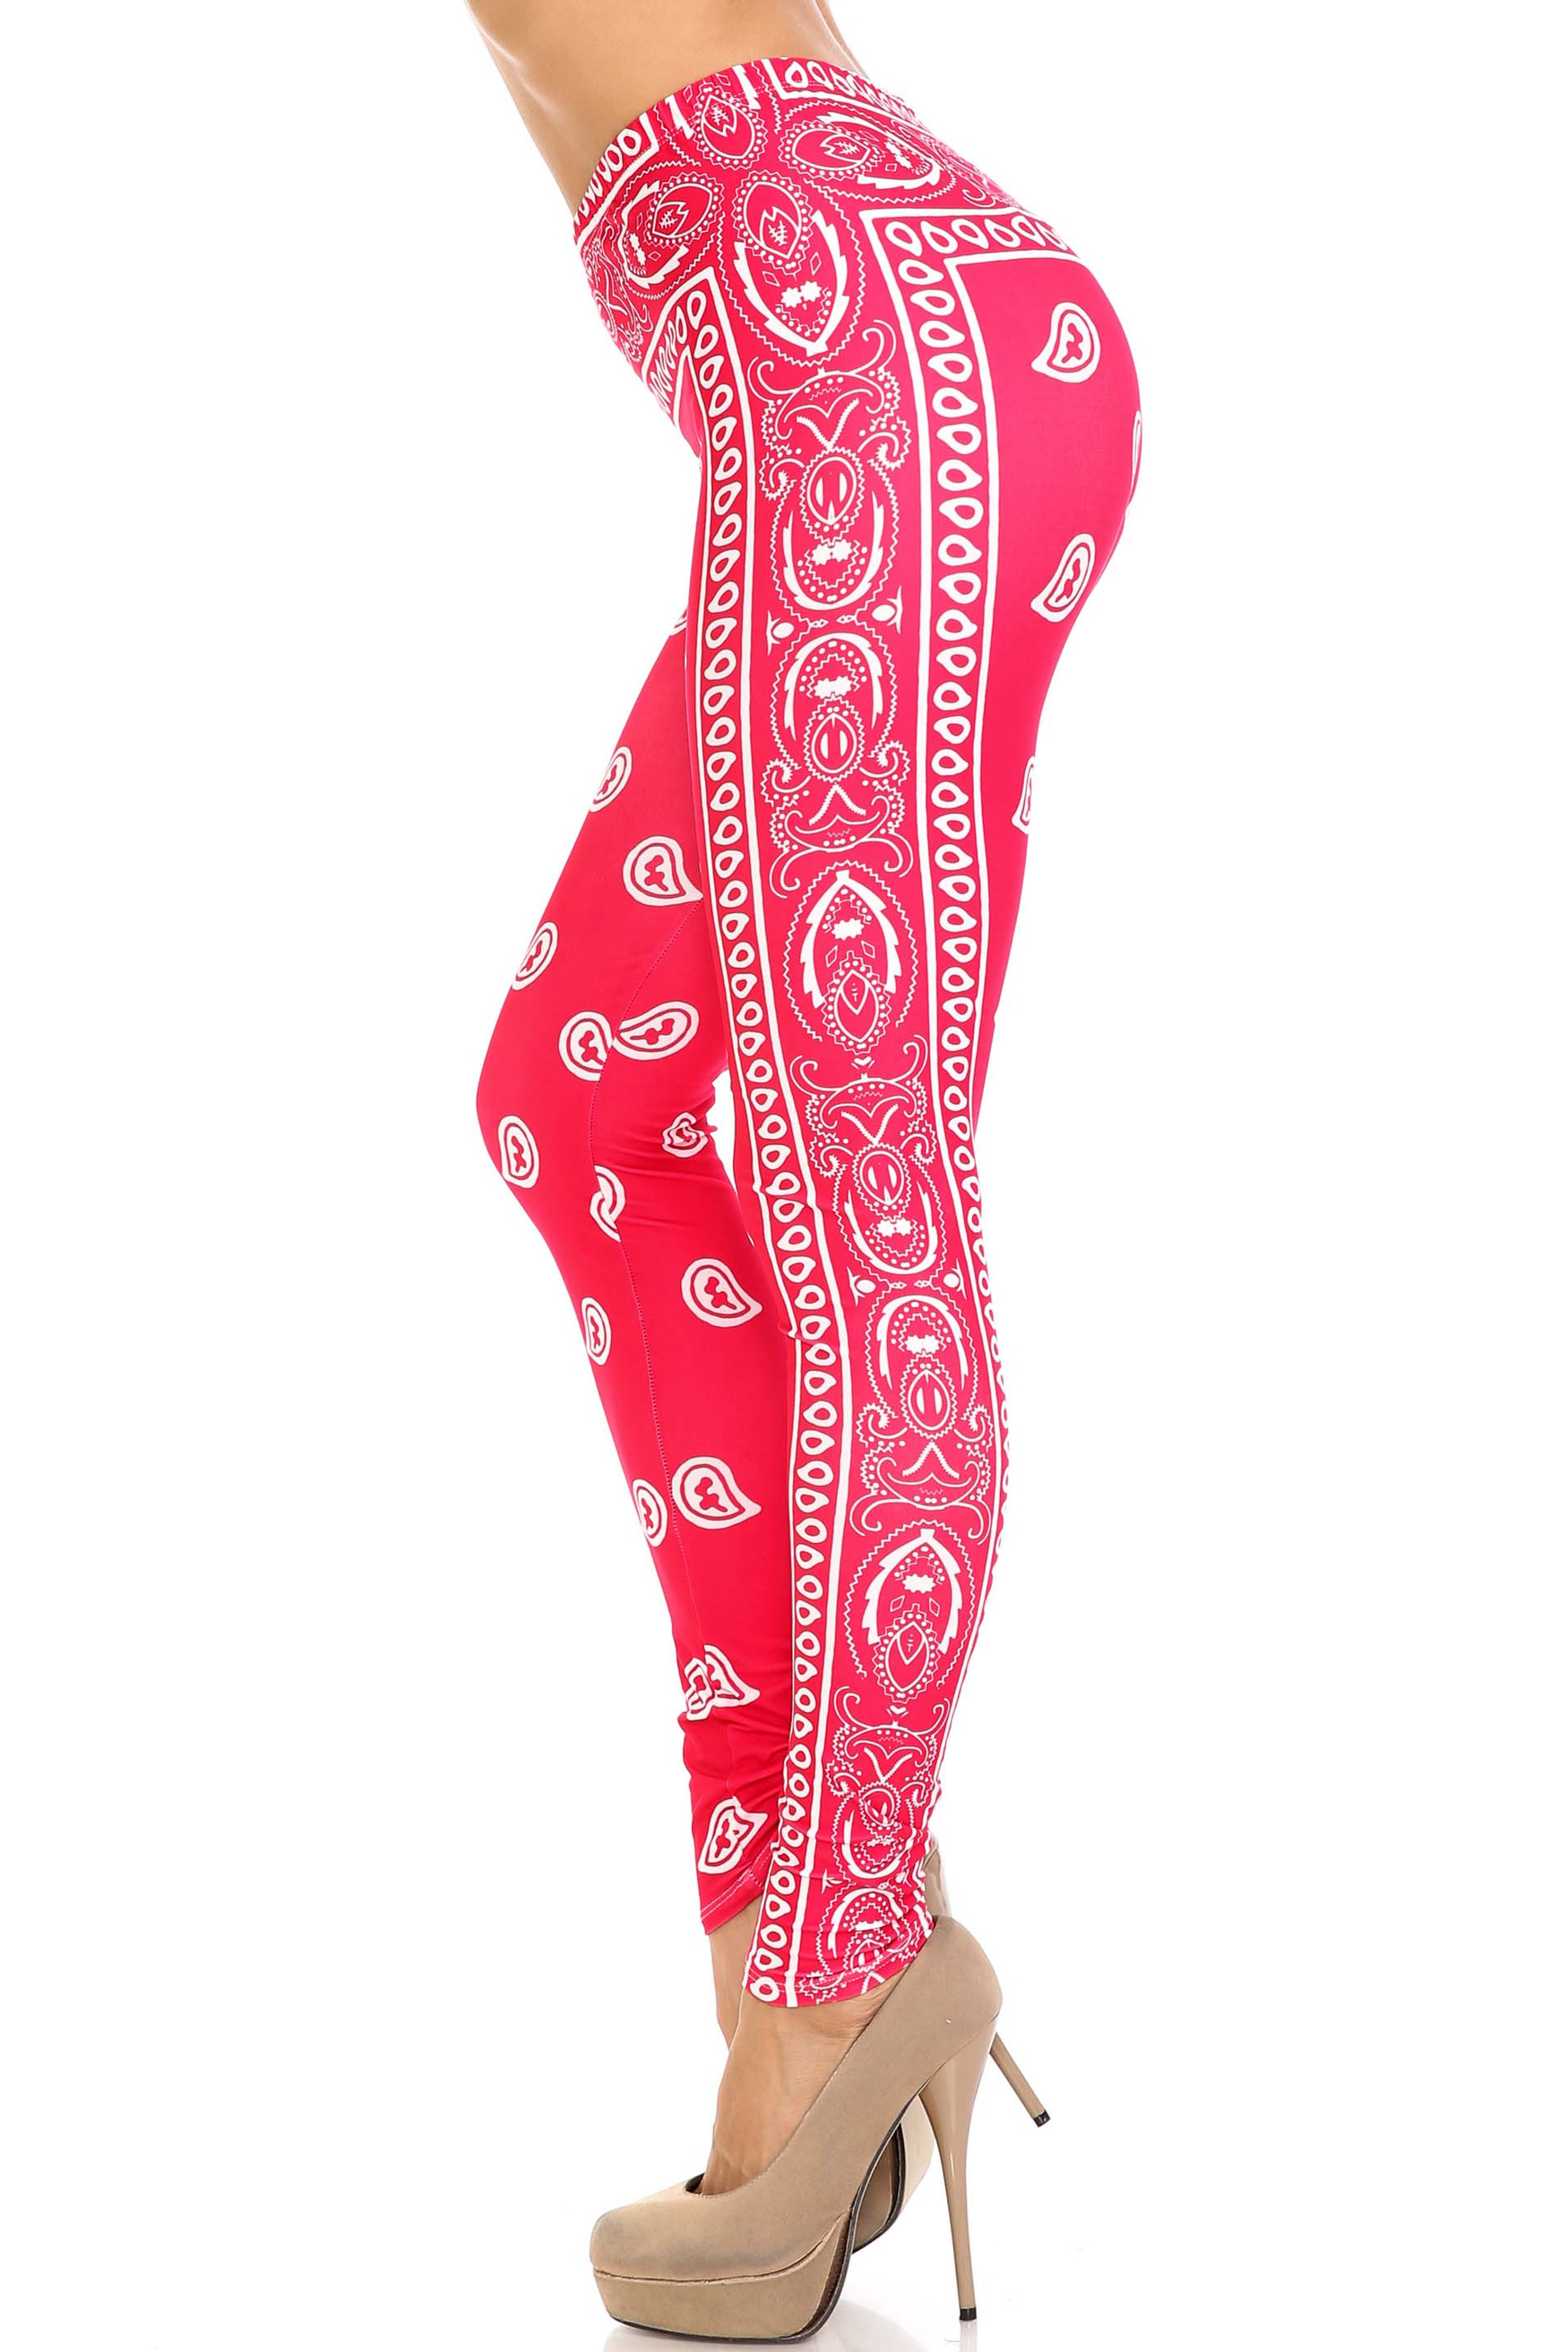 Creamy Soft Red Bandana Plus Size Leggings - USA Fashion™